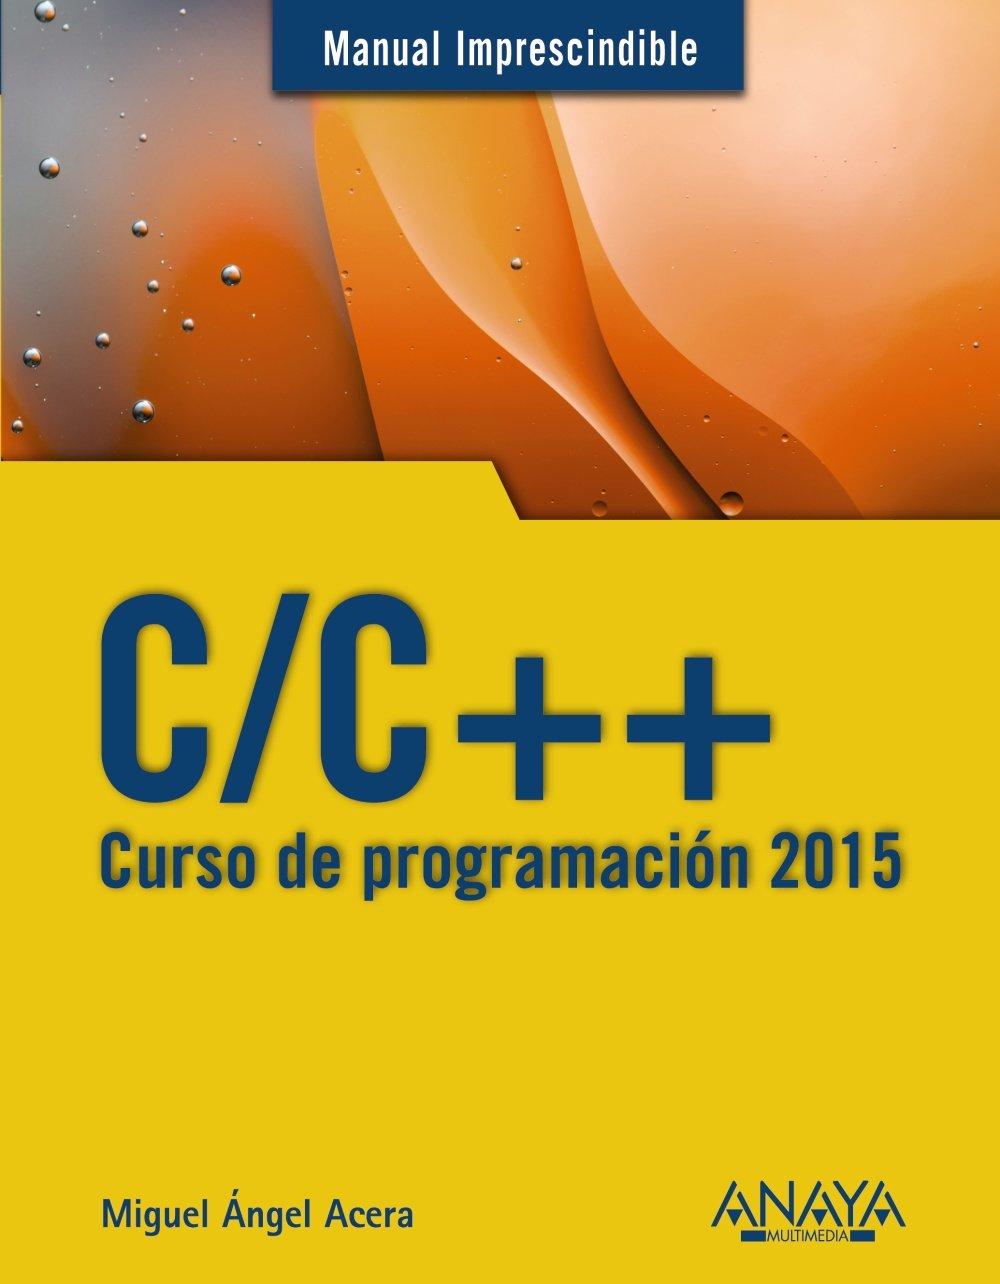 C/C++ Curso de programación 2015 / C/C++ programming course 2015 (Manual  Imprescindible / Essential Manual) (Spanish Edition): 9788441536234:  Computer ...